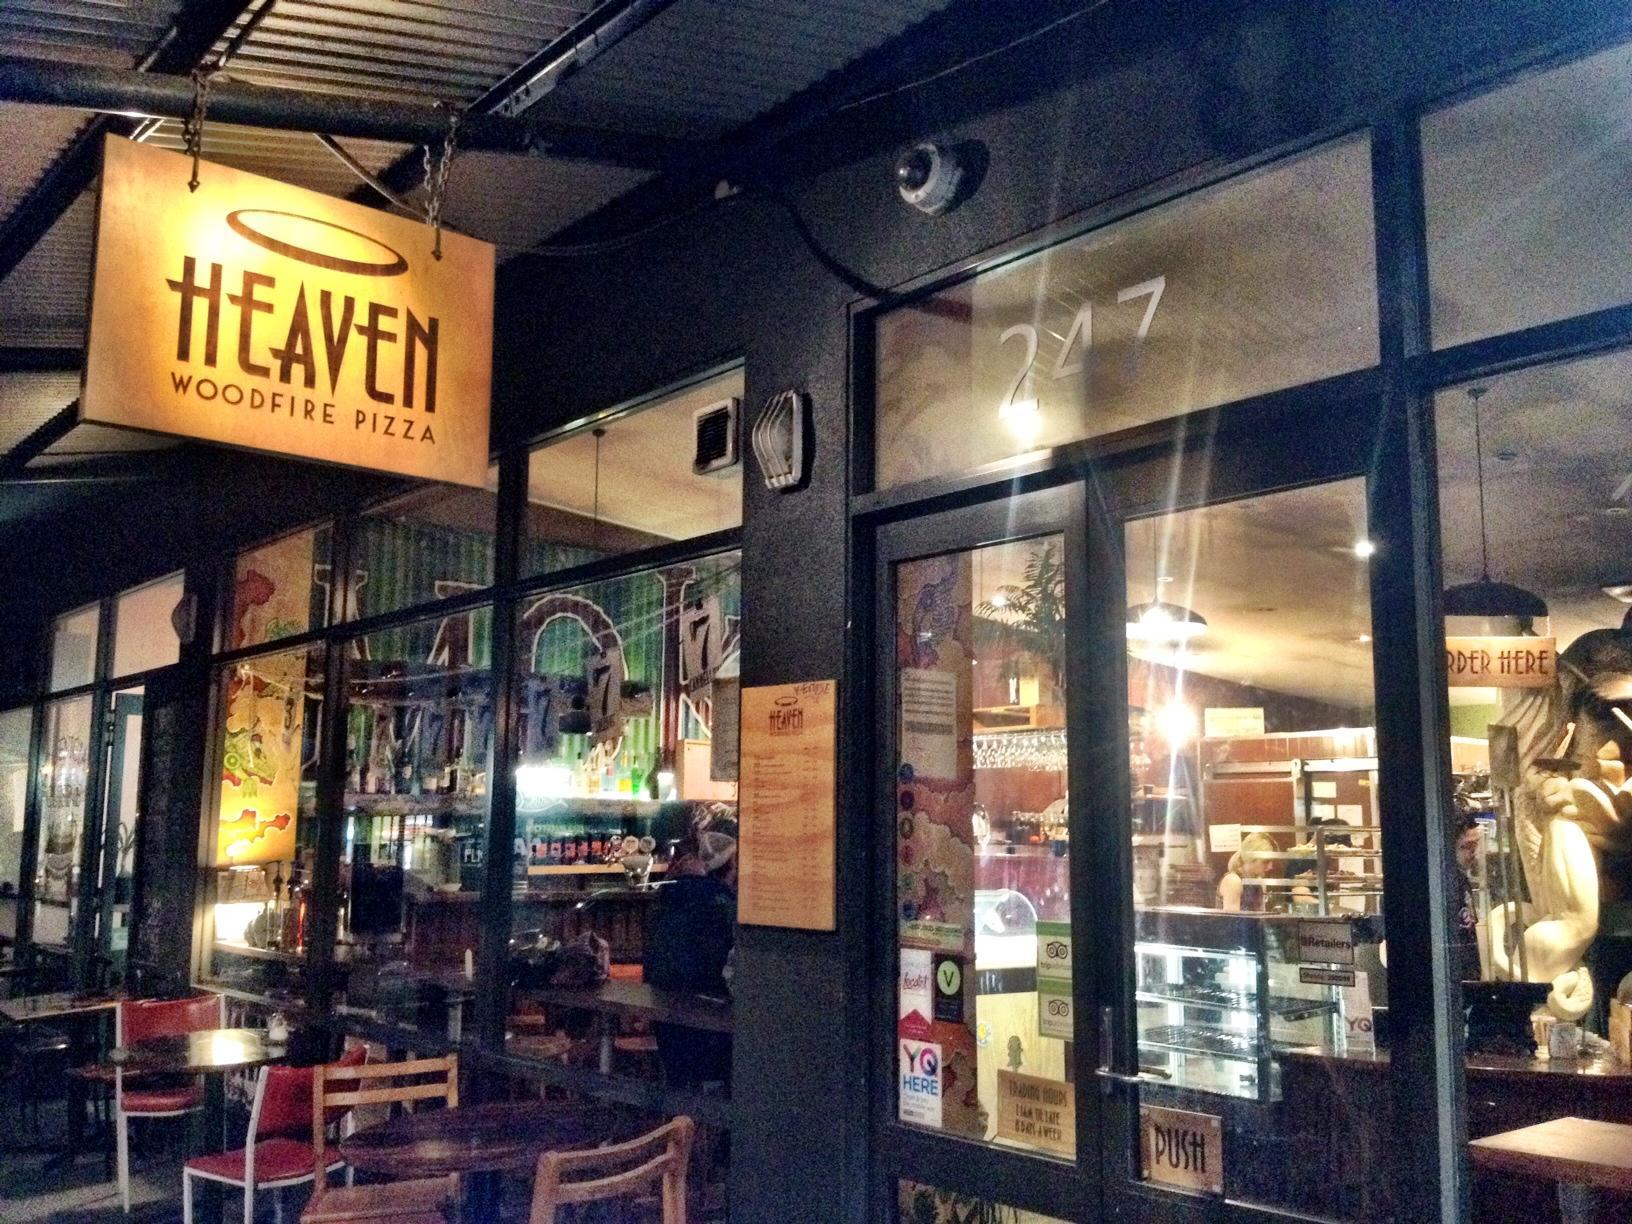 Heaven Woodfire Pizza